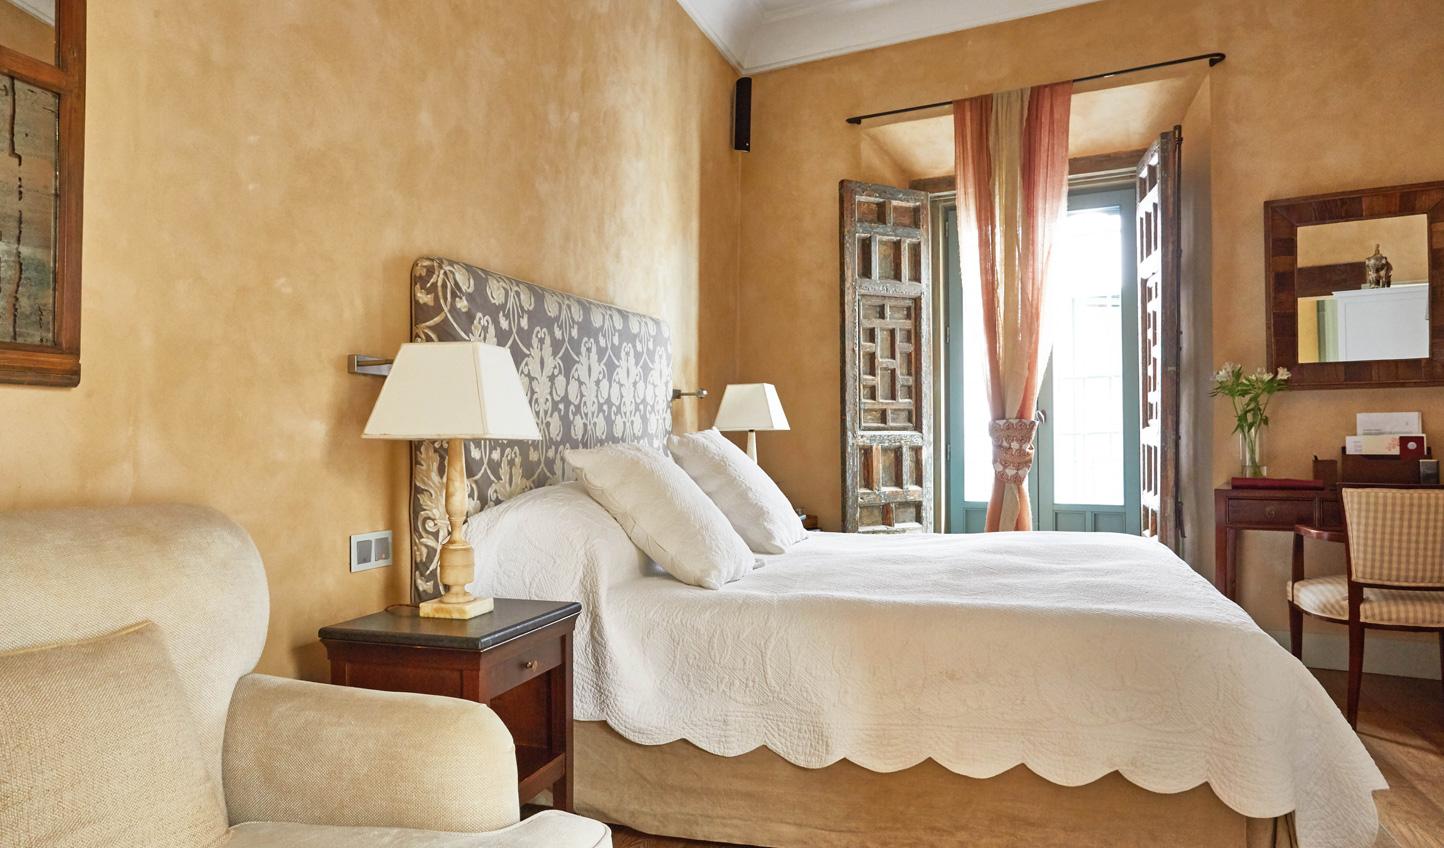 Beautiful rooms designed by Kuky Mora-Figueroa